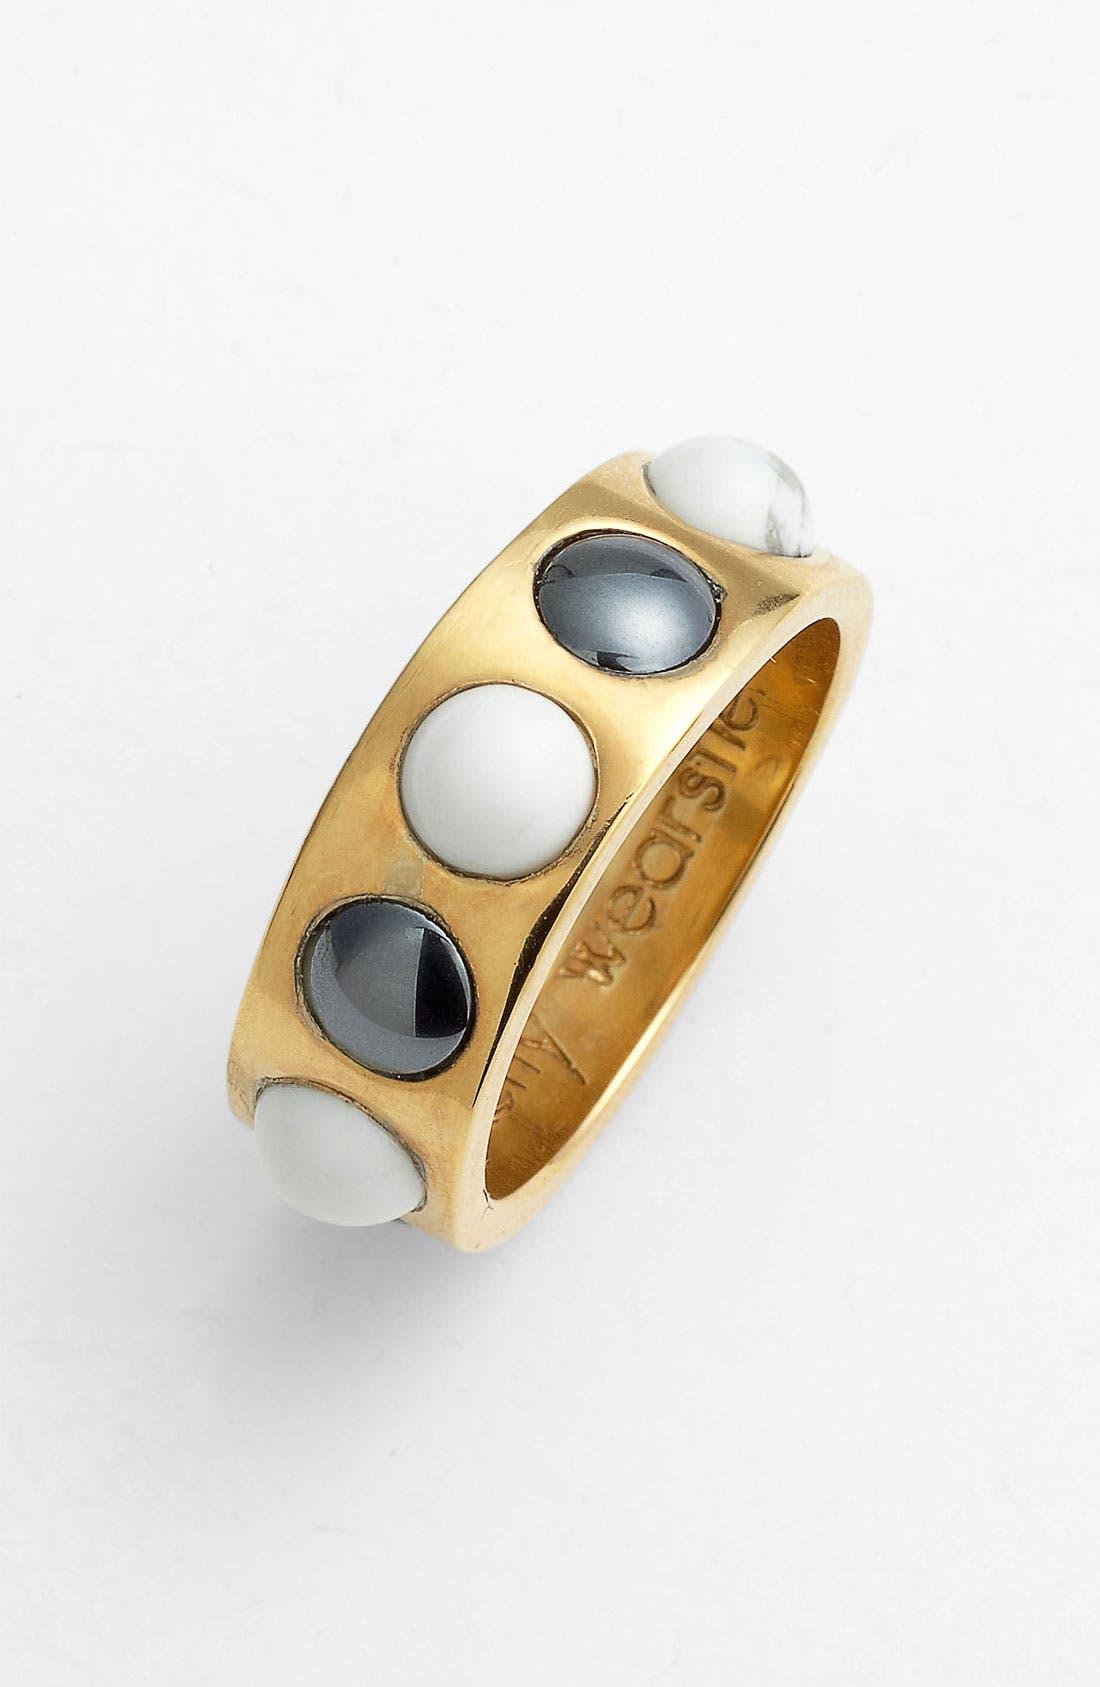 Main Image - Kelly Wearstler Cabochon Ring